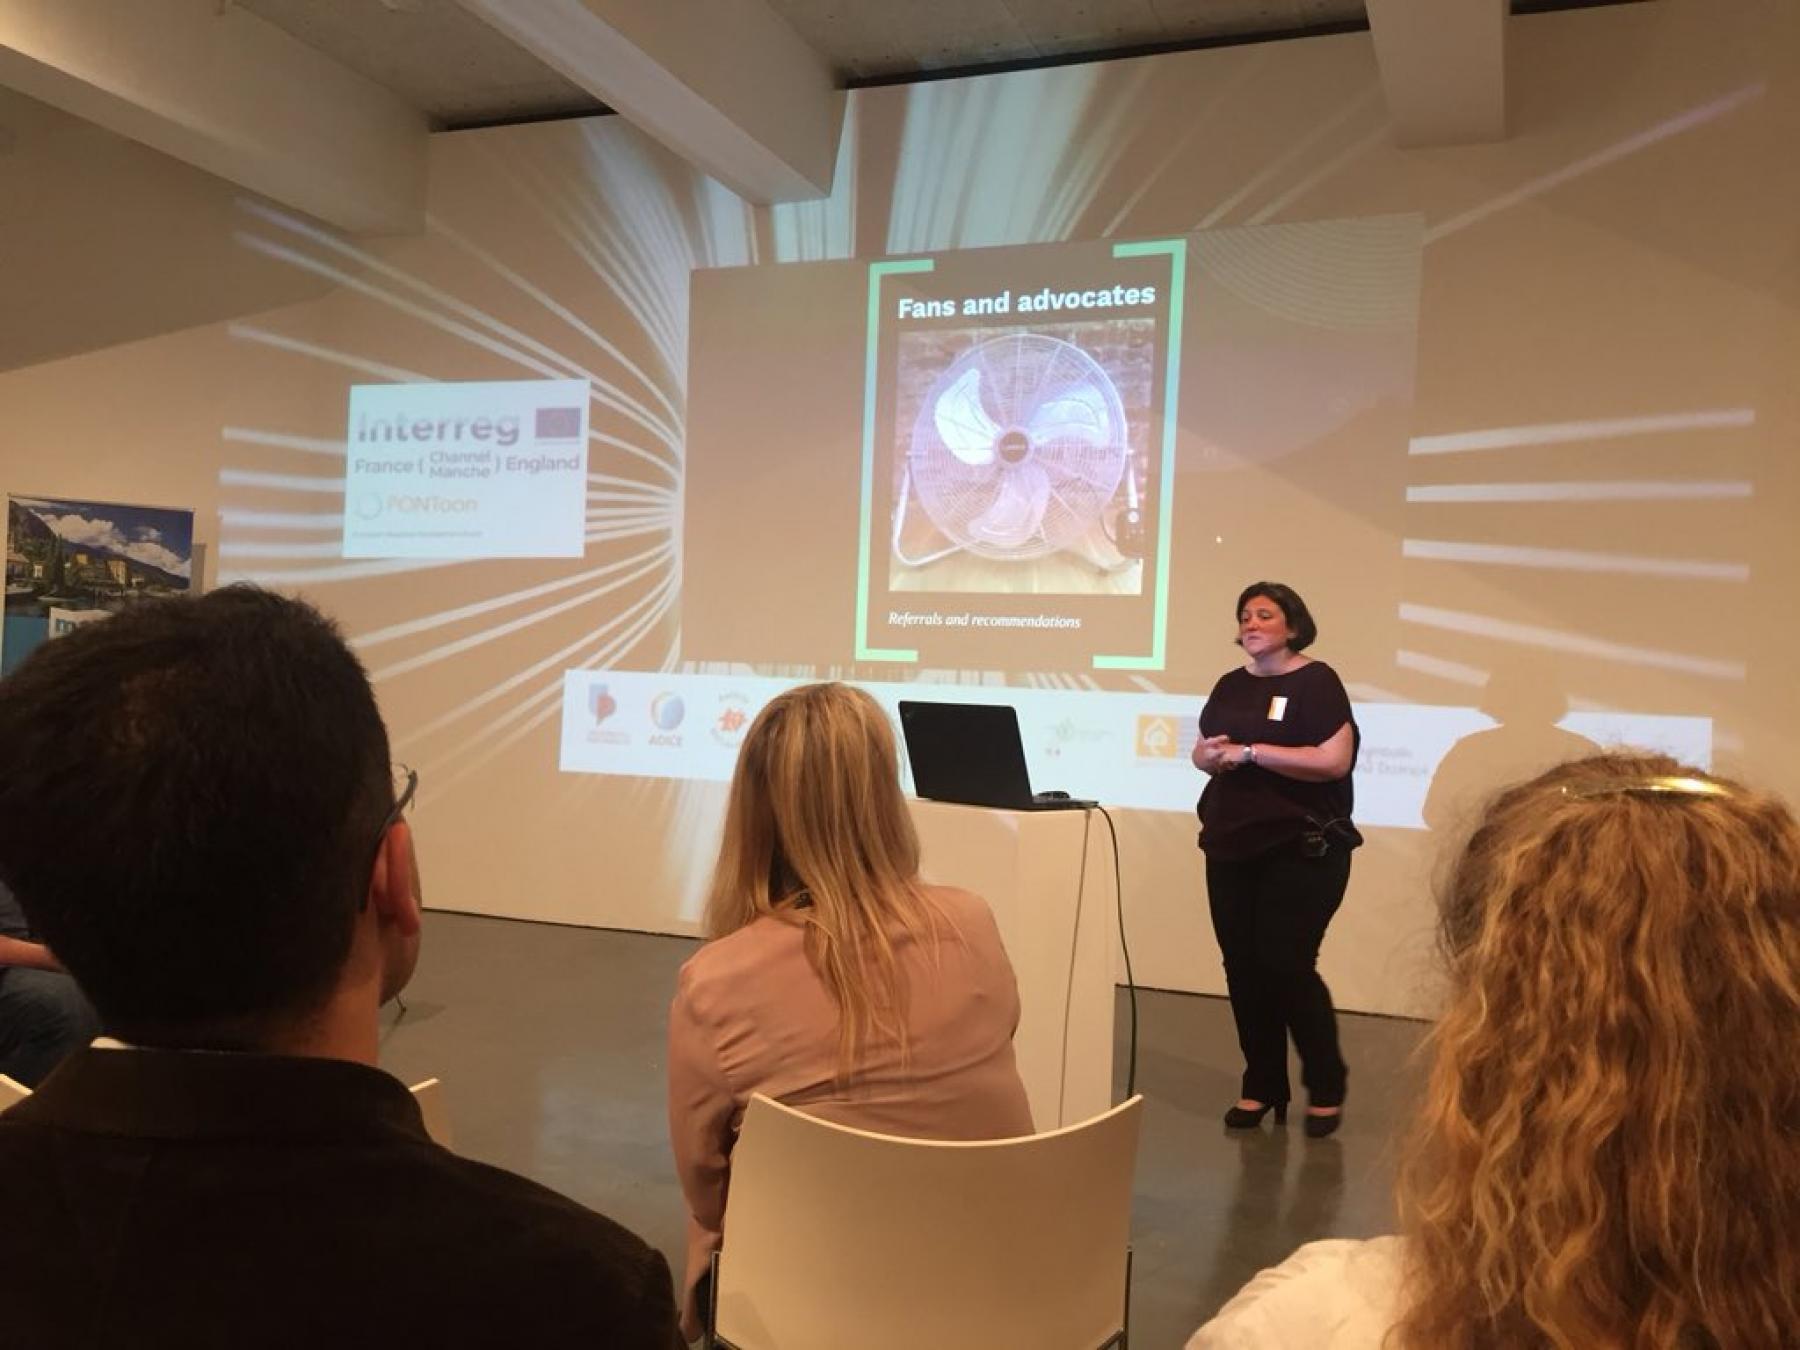 Digital Marketer Sarah Pugh gives an overview of digital media marketing